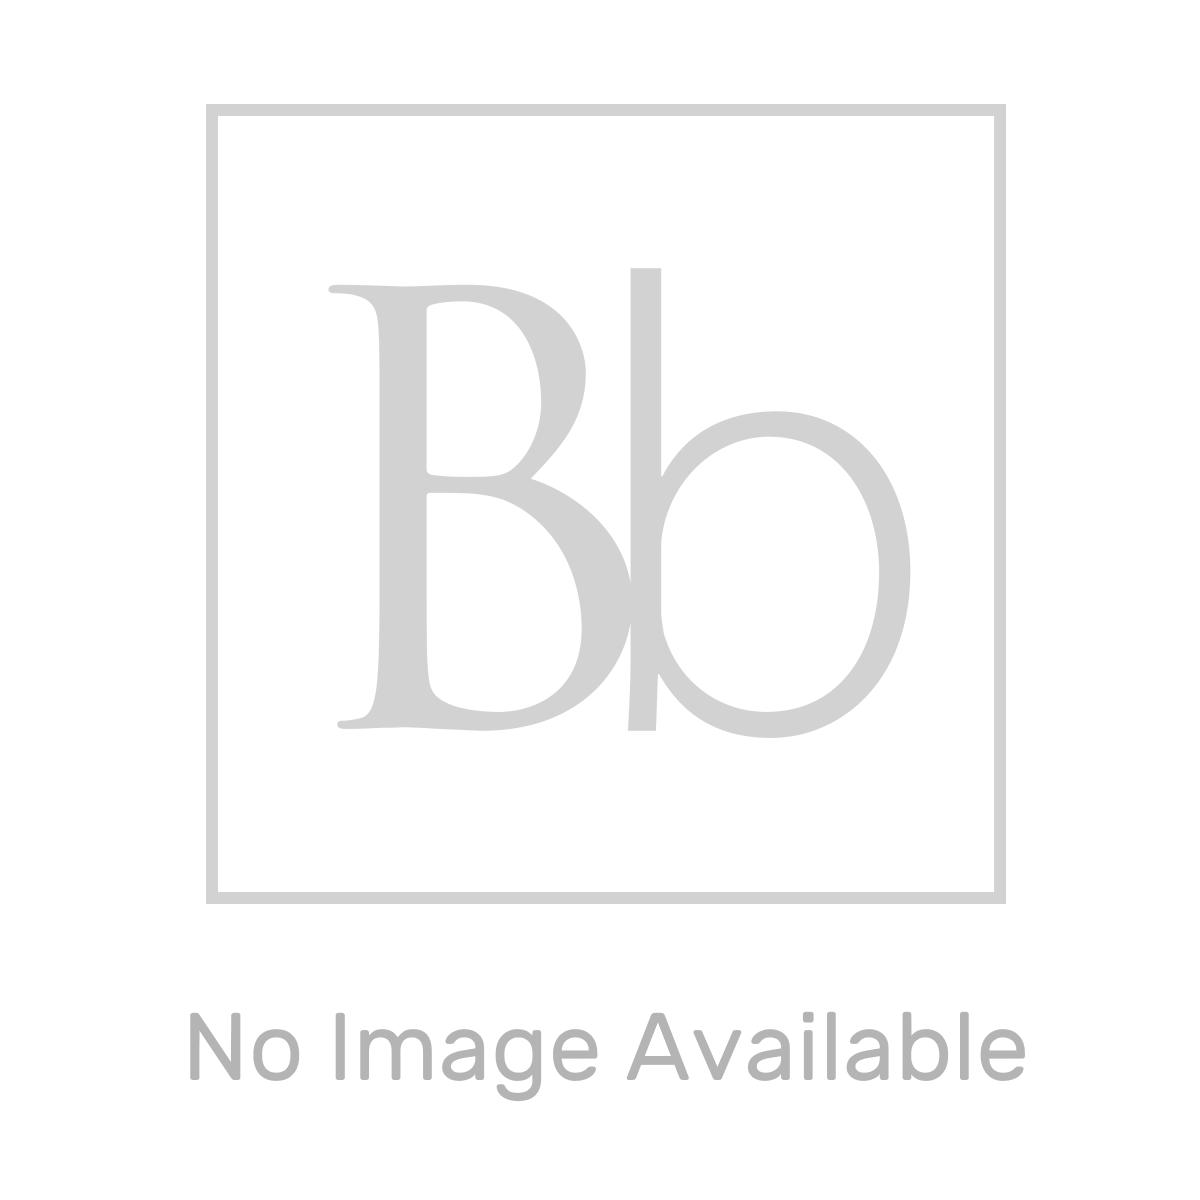 Frontline Aquaglass+ Sphere Black Tinted Offset Quadrant Shower Enclosure Handle